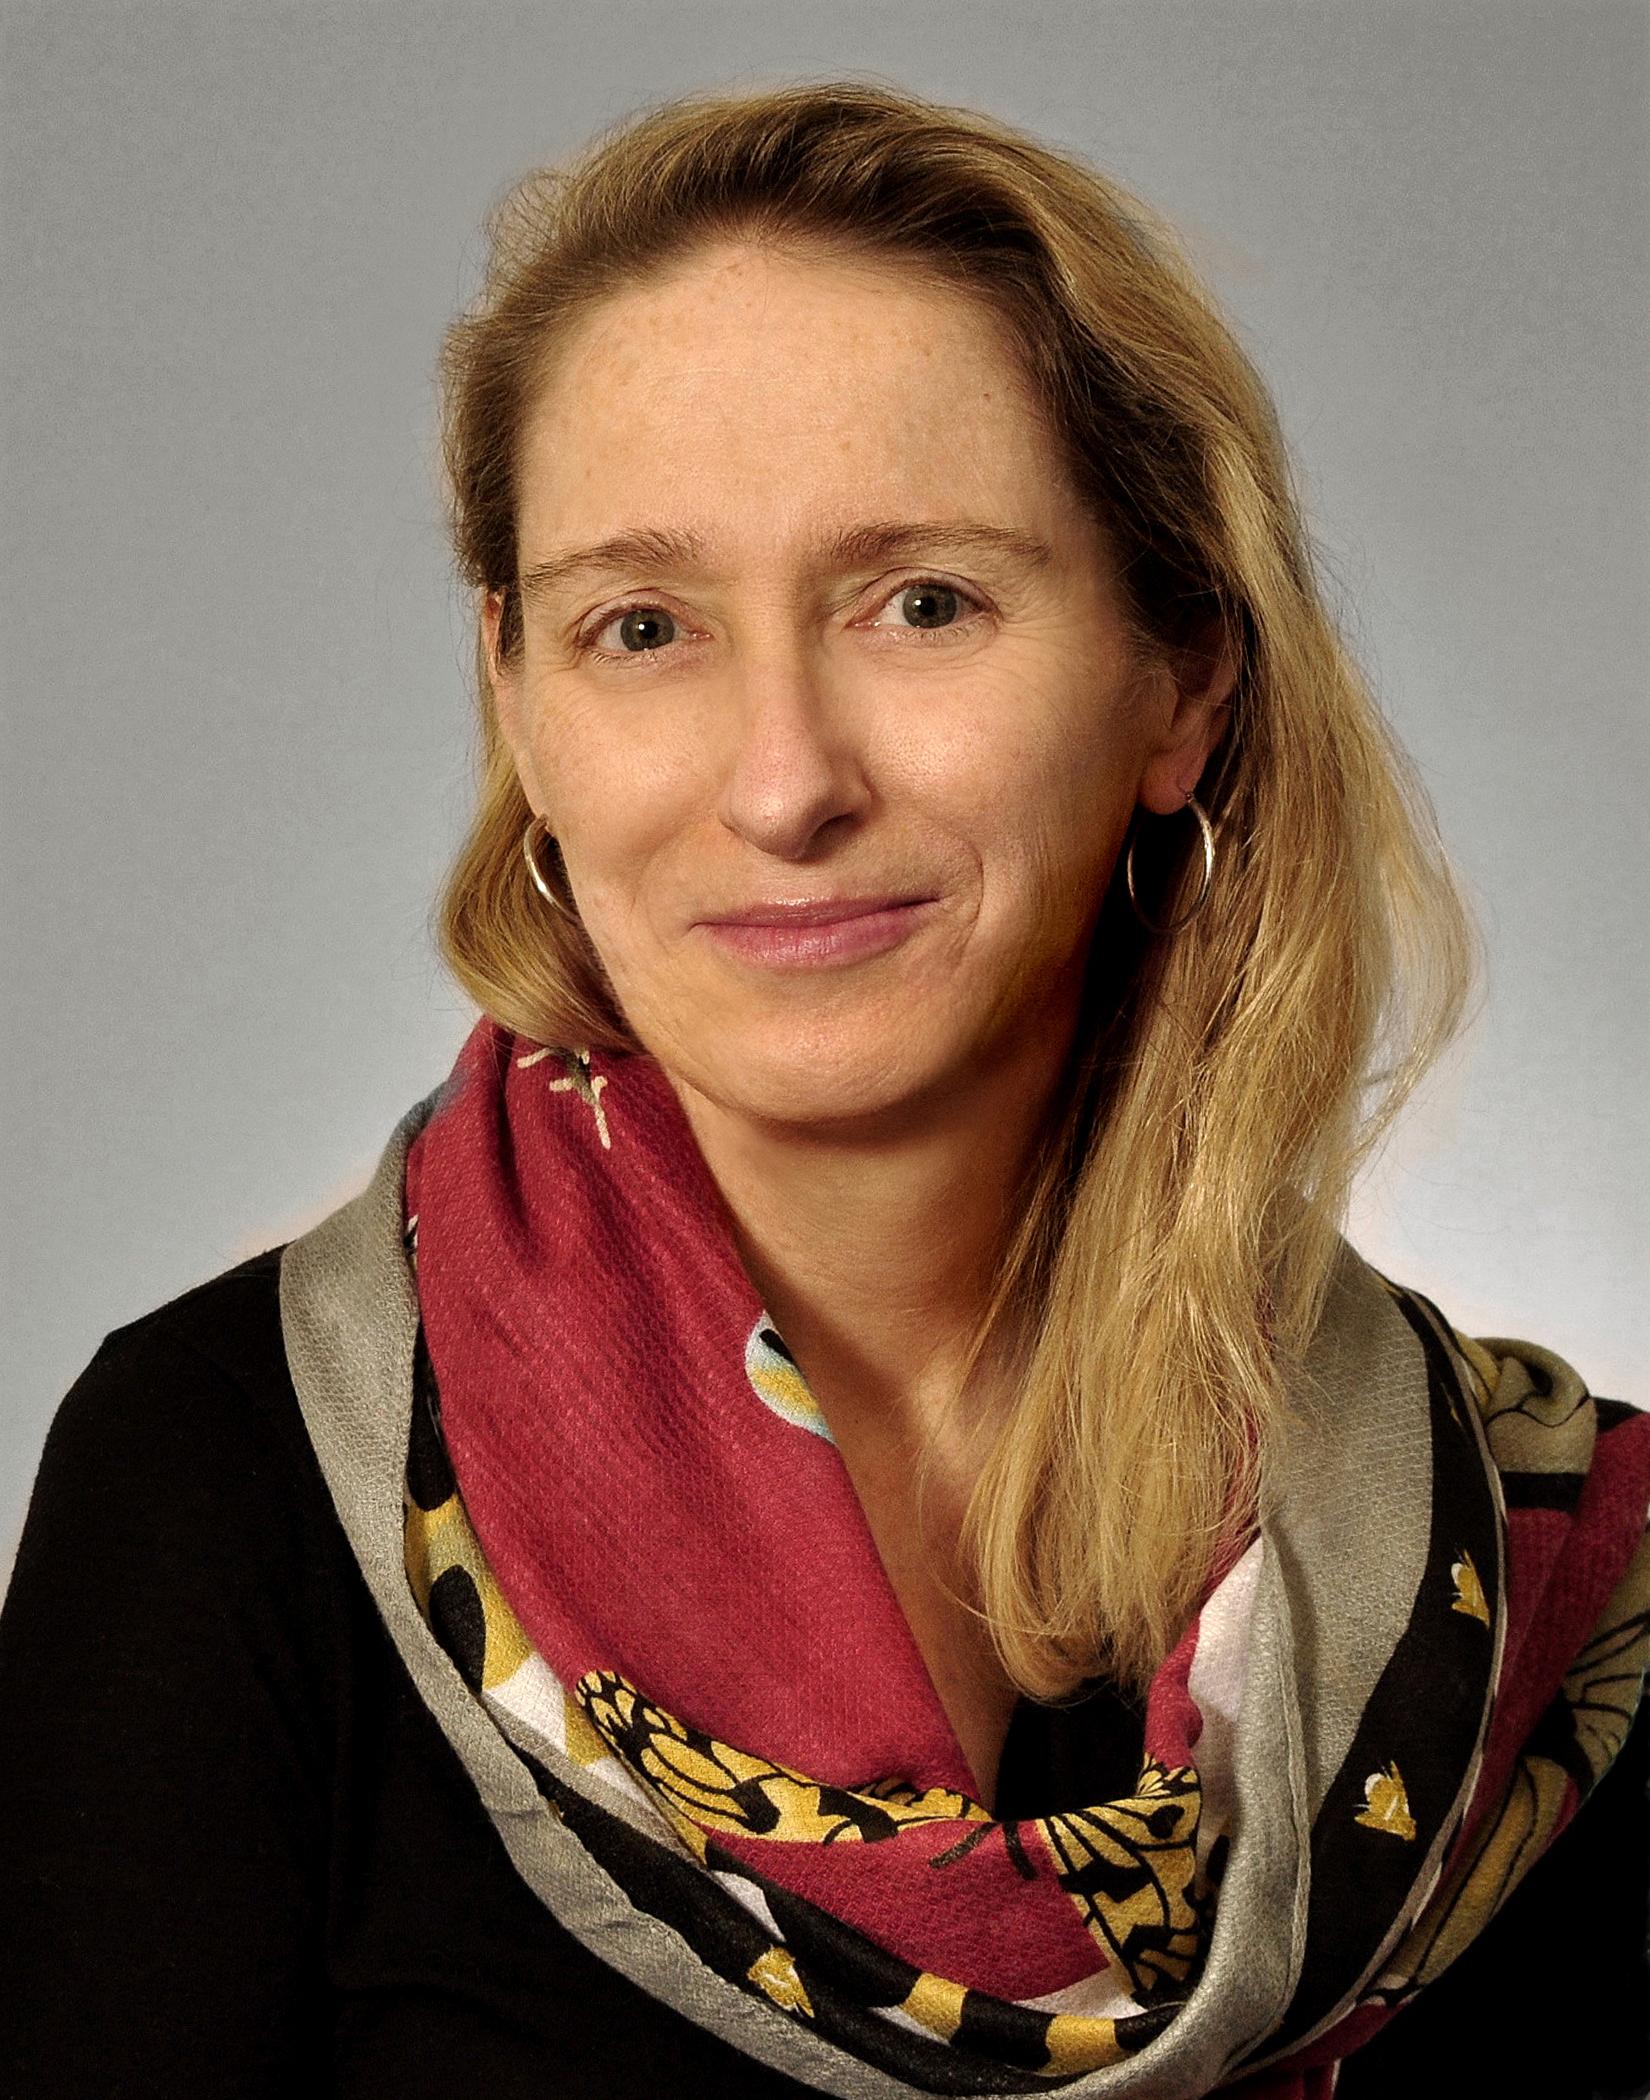 Liz Latimer